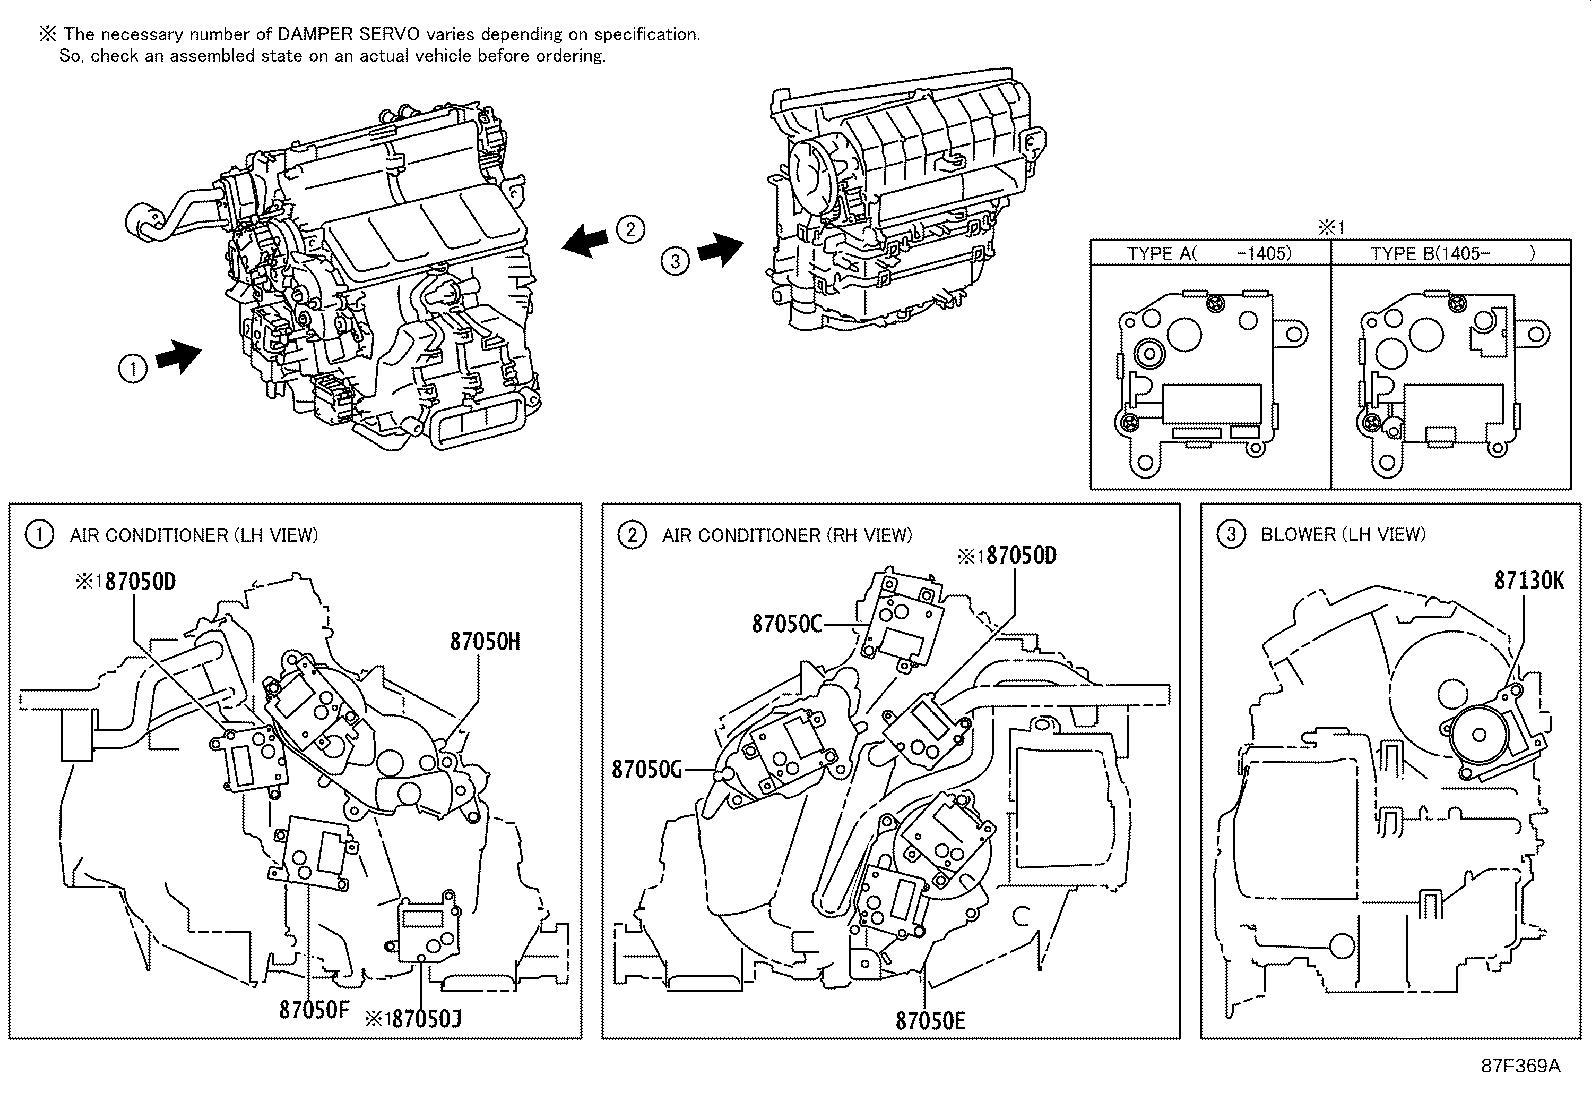 Lexus Gs 350 Damper Servo Sub Assembly Air Conditioner